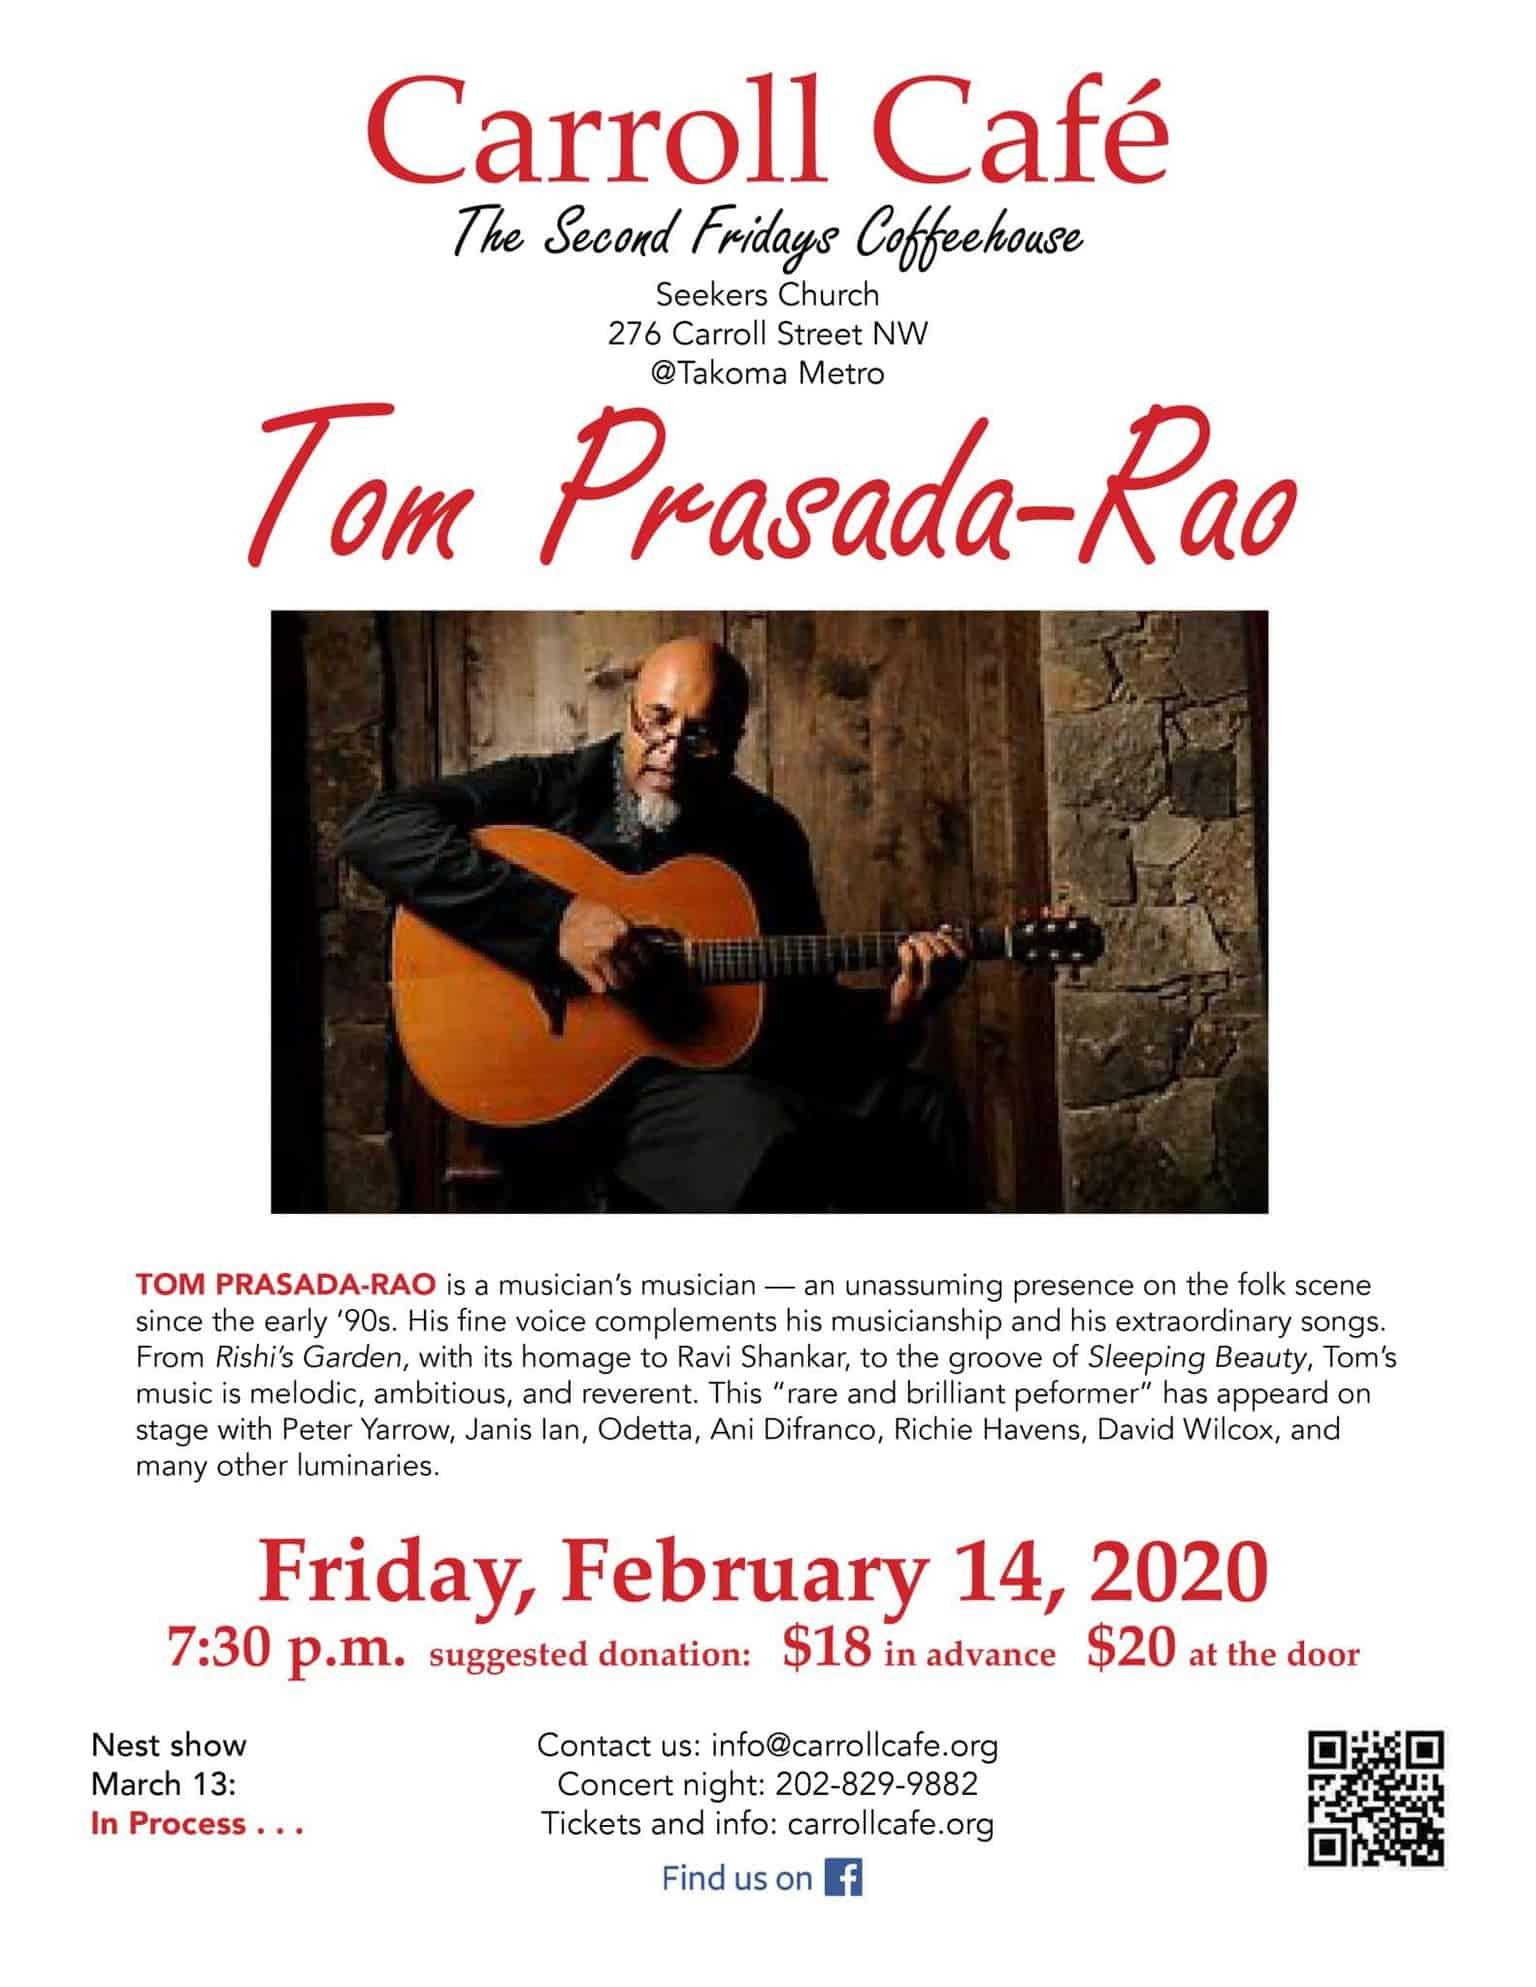 Carroll Cafe presents TOM PRASADA-RAO